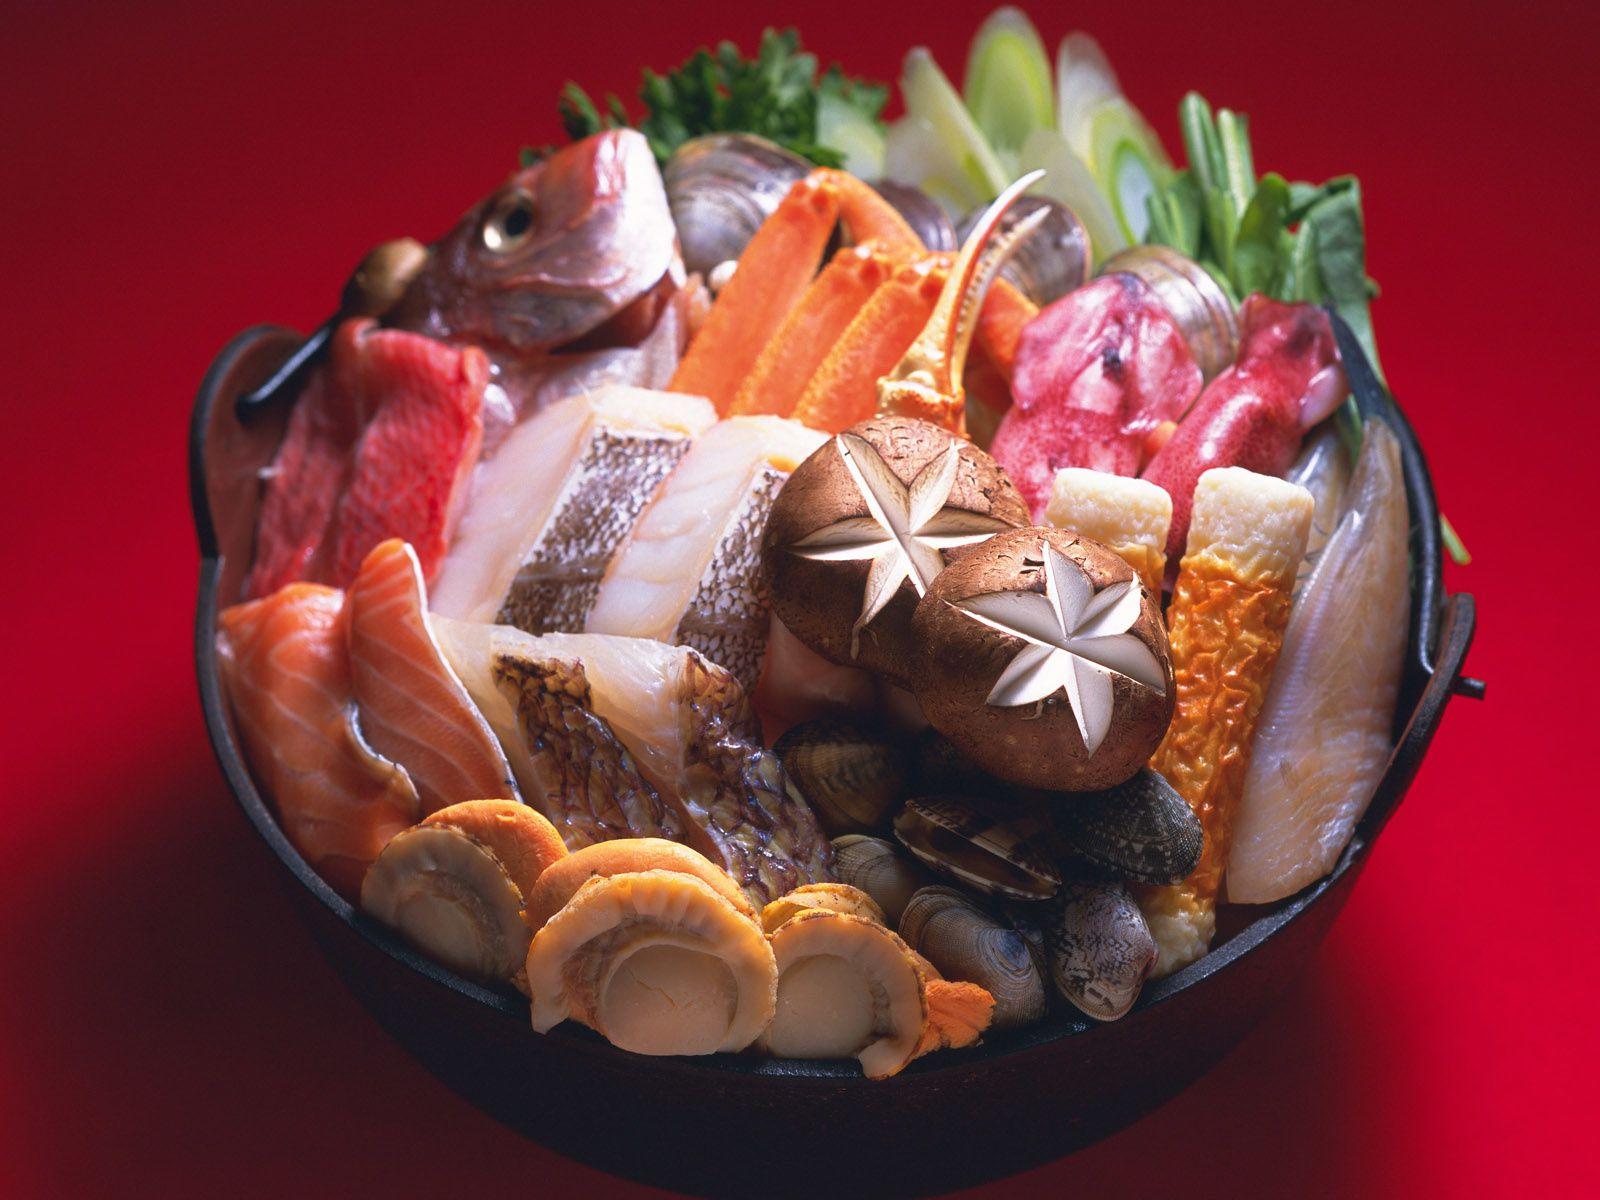 Bon appétit - Suhis - Poisson - Nourriture - Wallpaper - Free